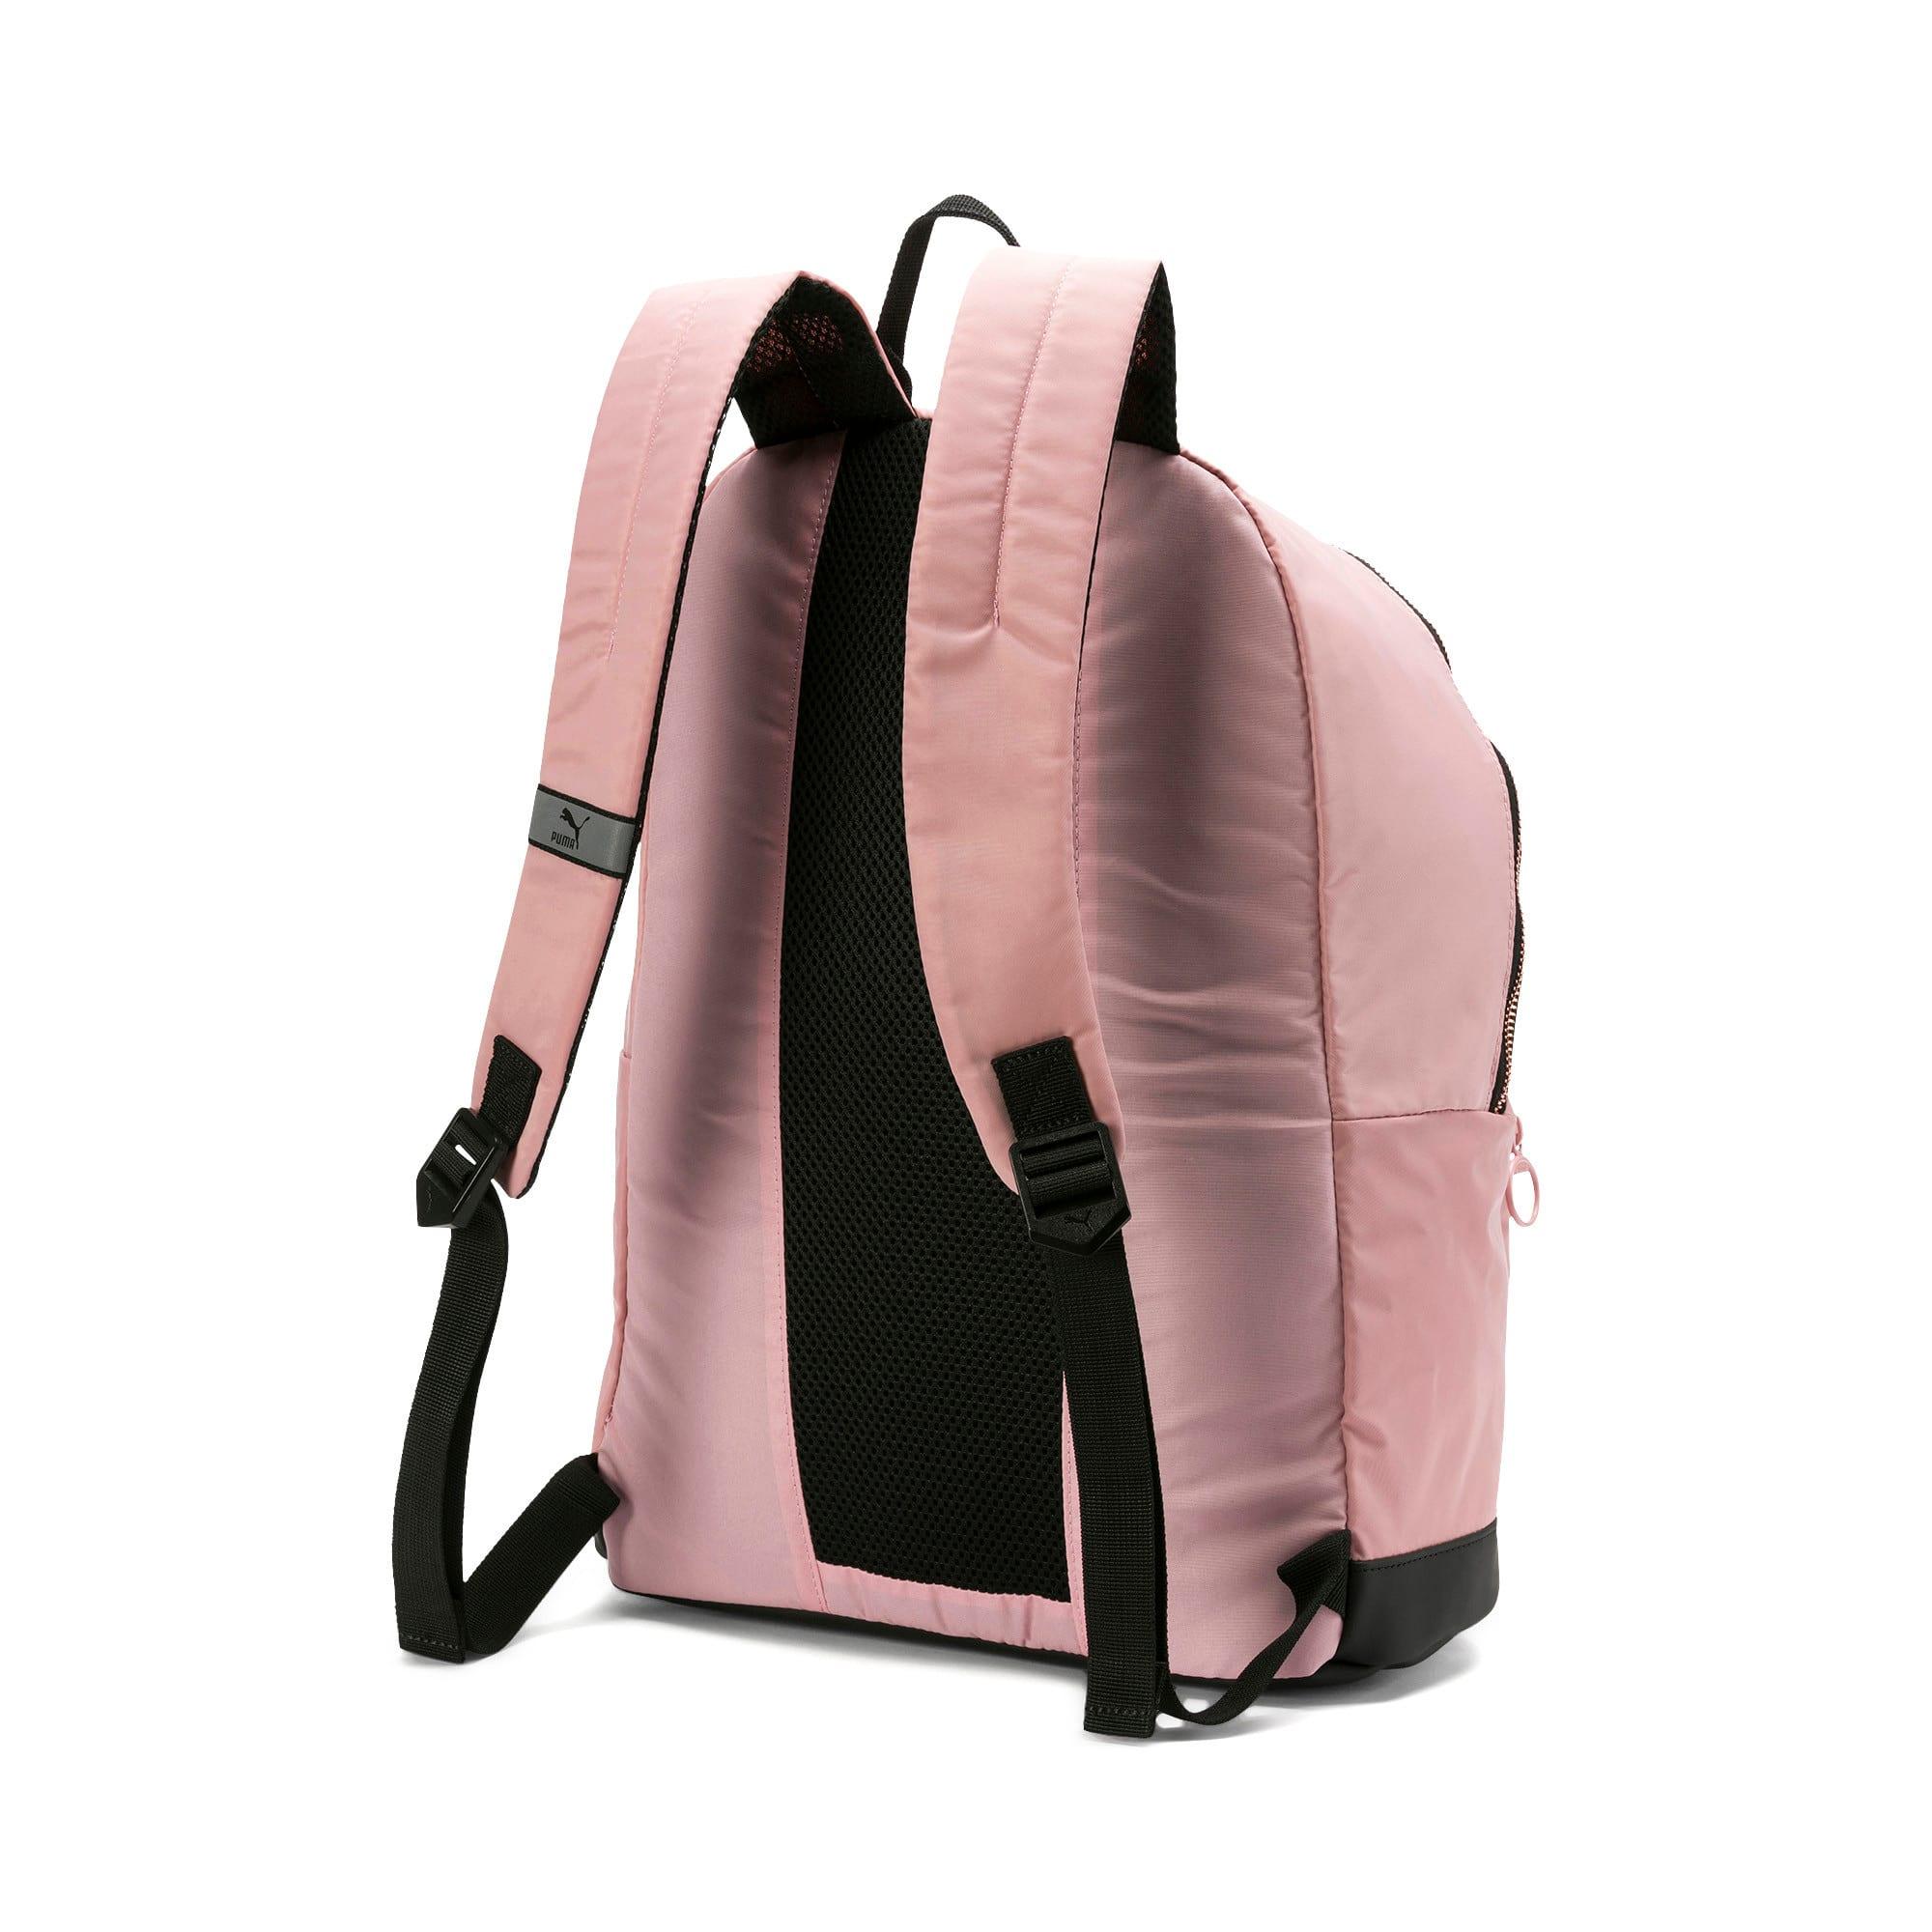 Thumbnail 3 of Originals Trend Backpack, Bridal Rose, medium